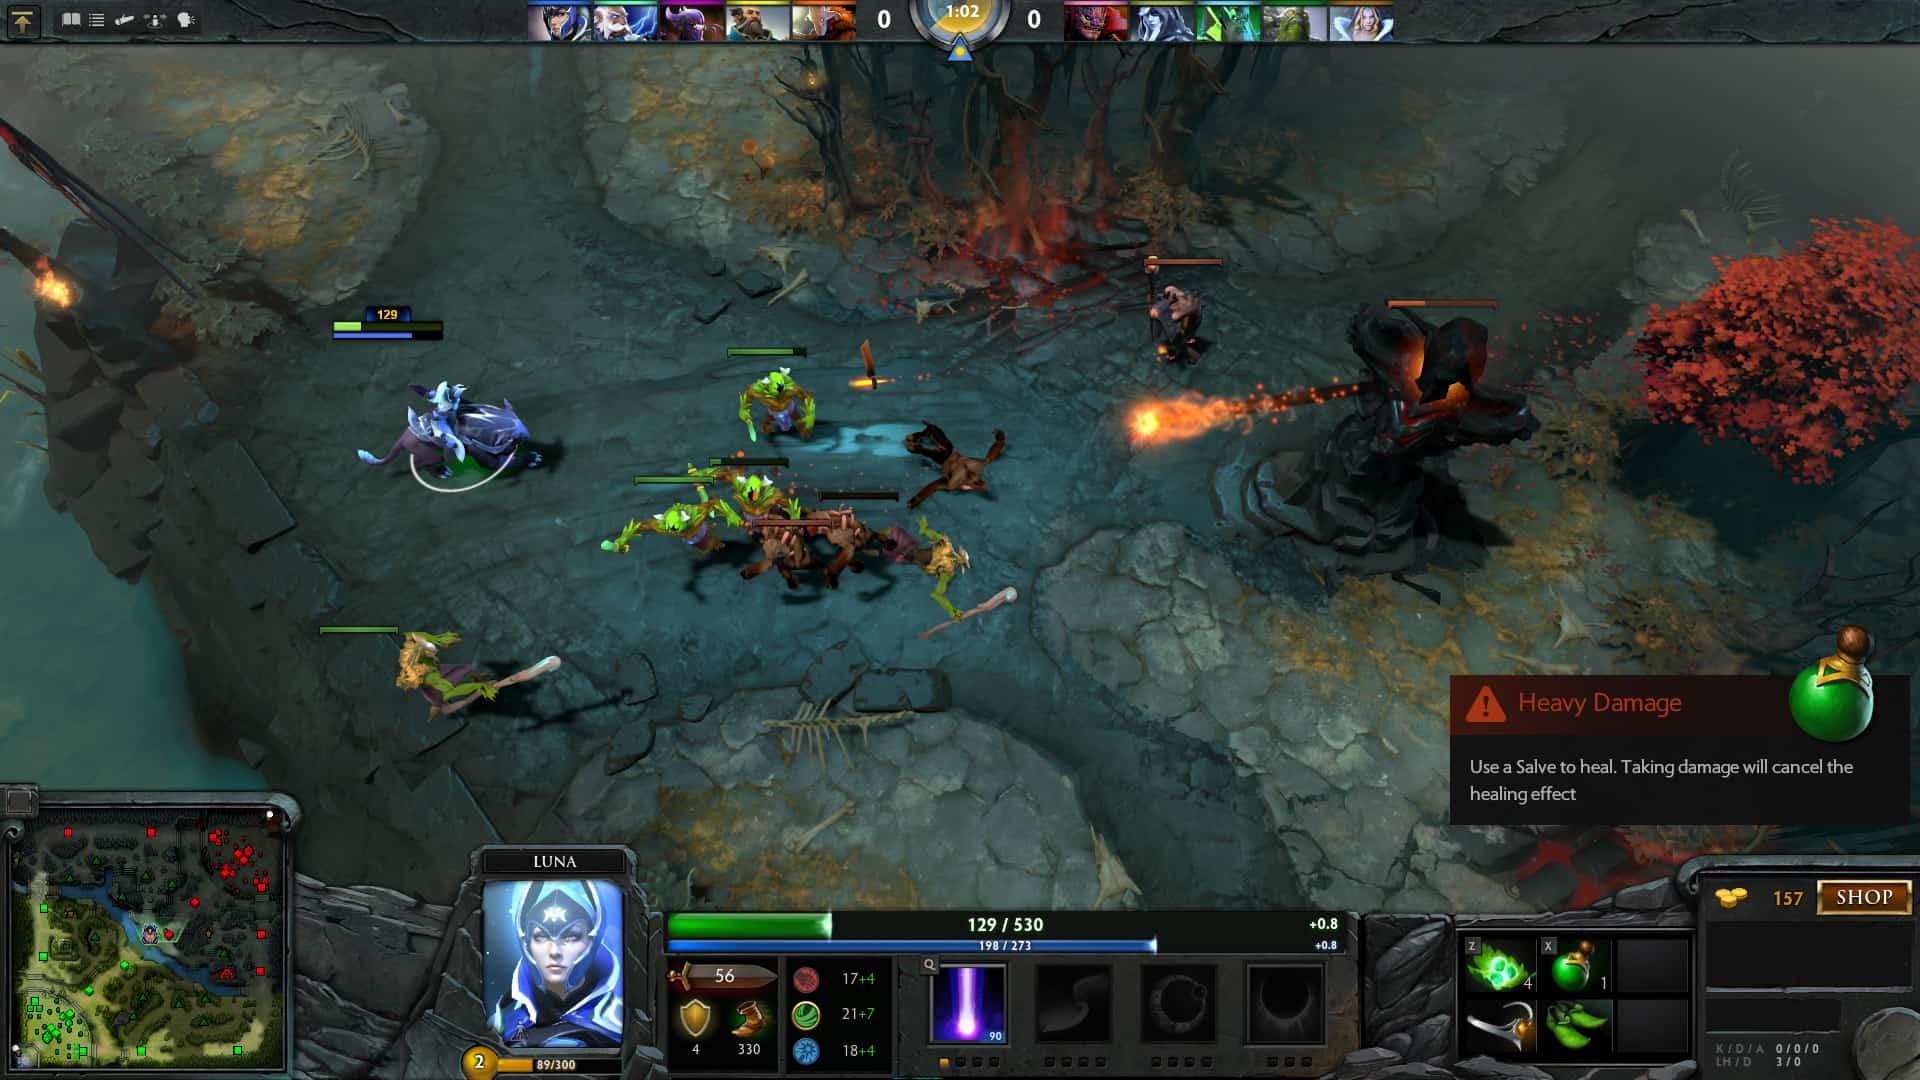 jogos-multiplayer-para-pc-dota2